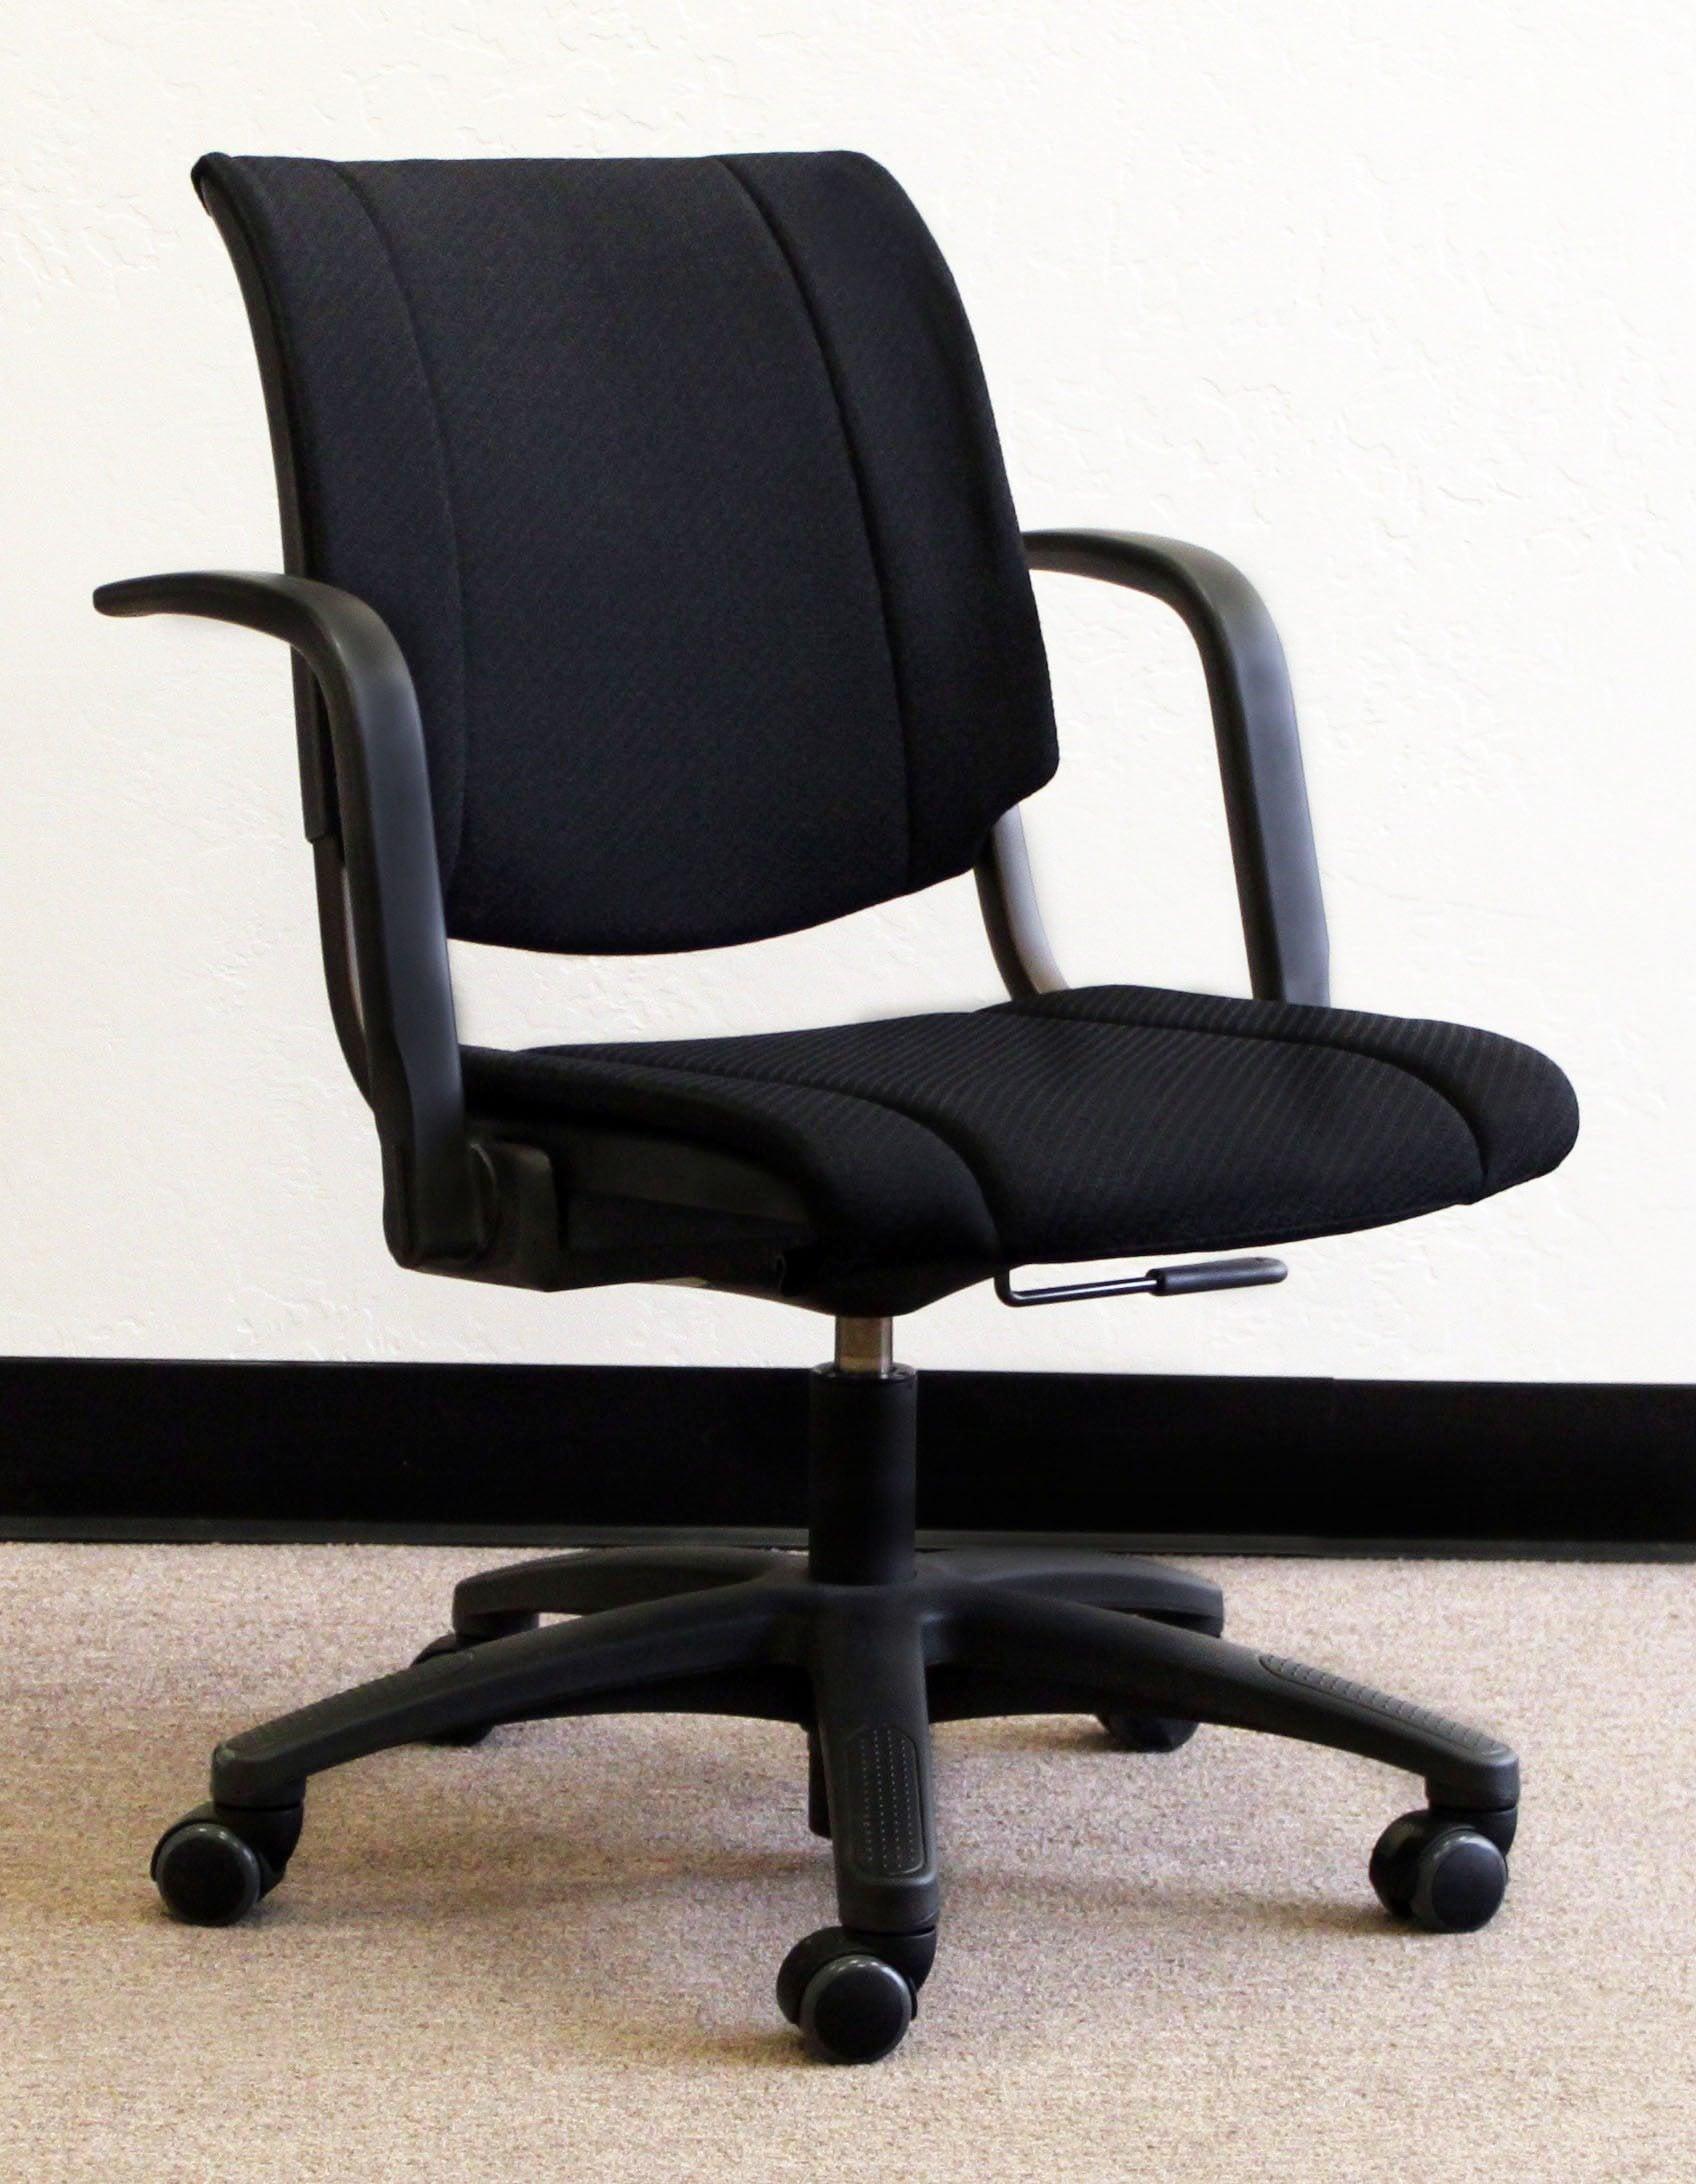 HAG Conventio 9512 Used Task Chair Black